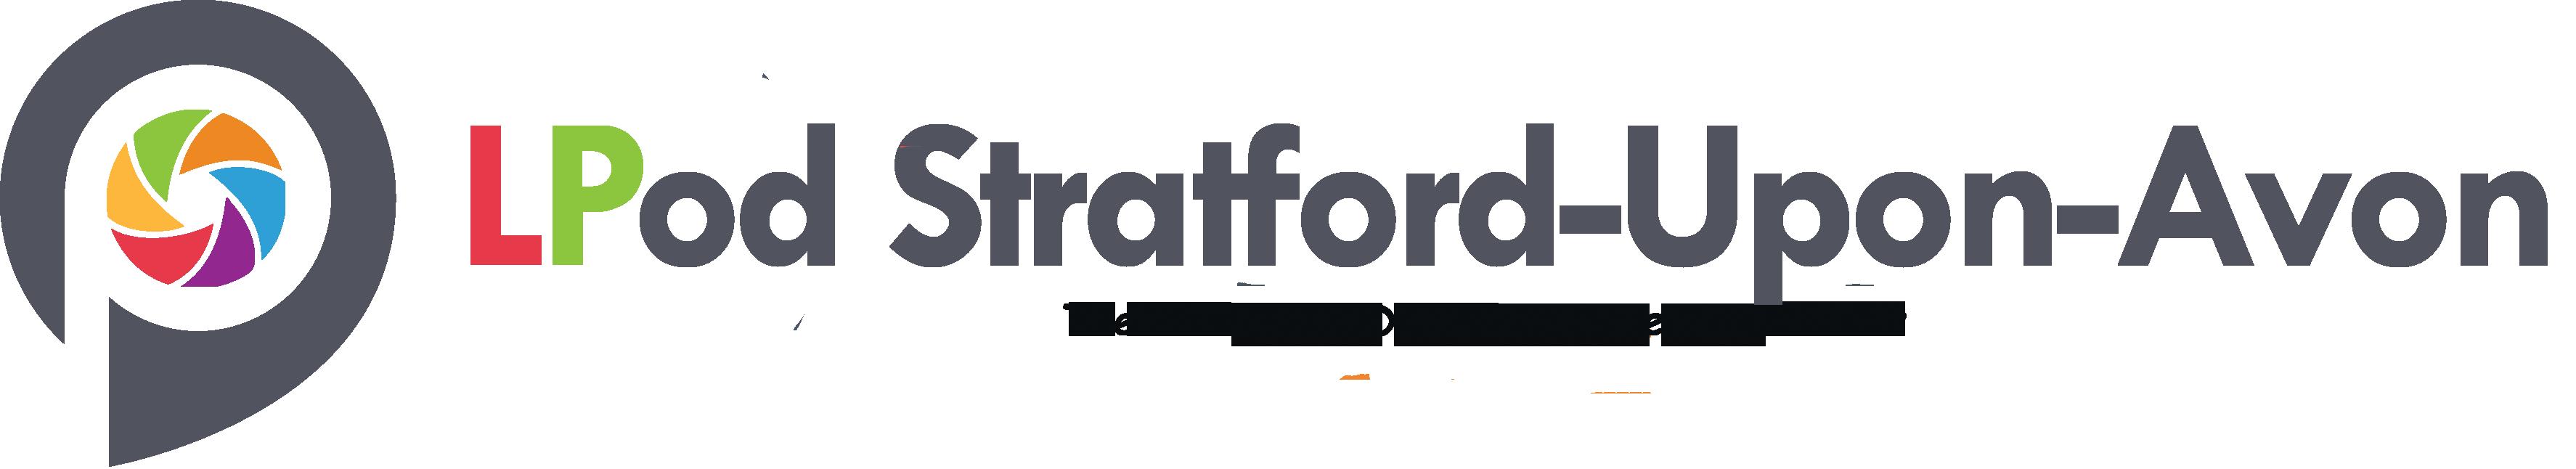 intensive driving courses startford upon avon, intensive driving lessons stratford upon avon, intensive driving school stratford upon avon